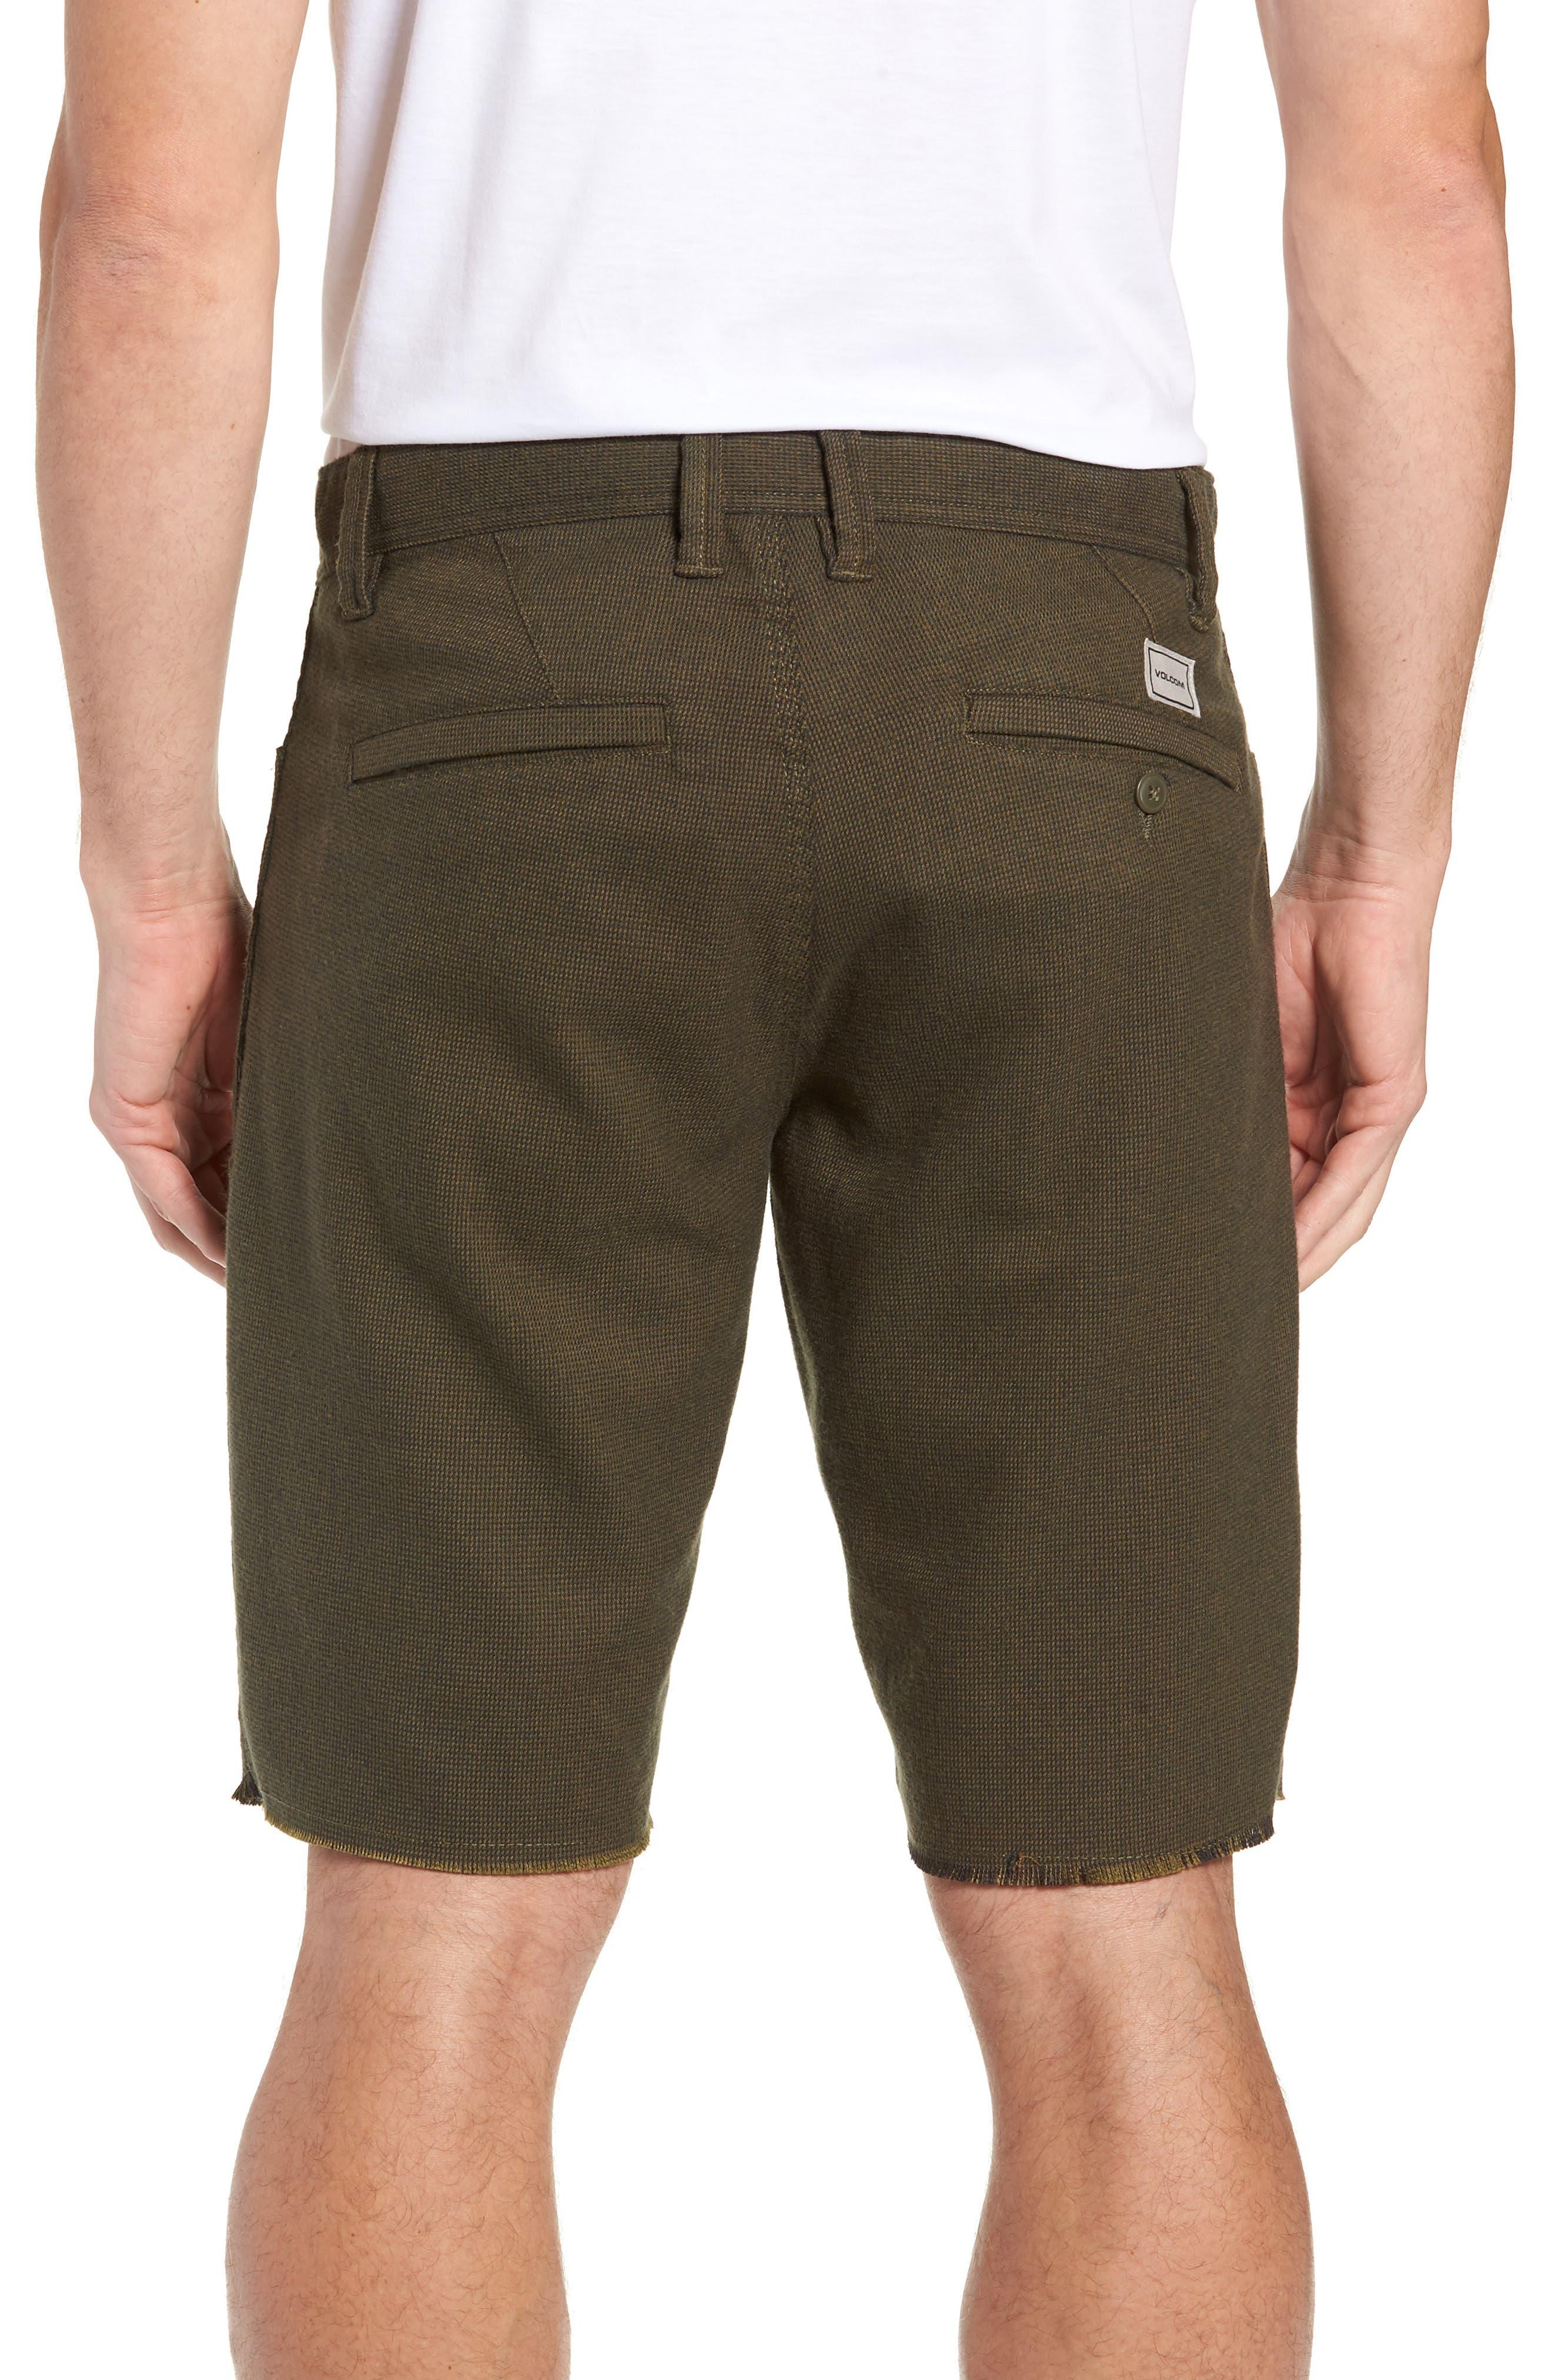 Gritter Thrifter Shorts,                             Alternate thumbnail 2, color,                             GREENTEA